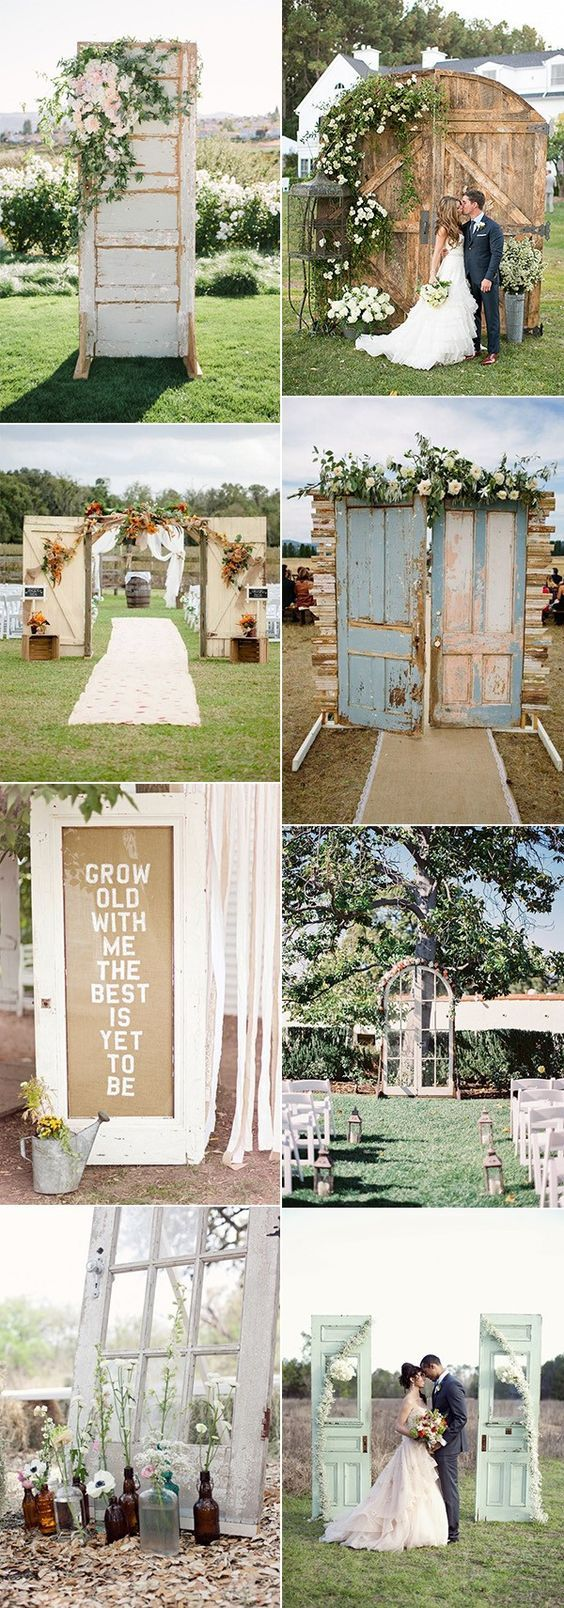 Vintage style wedding decoration ideas   Wedding Decoration Ideas with Vintage Old Doors  Page  of